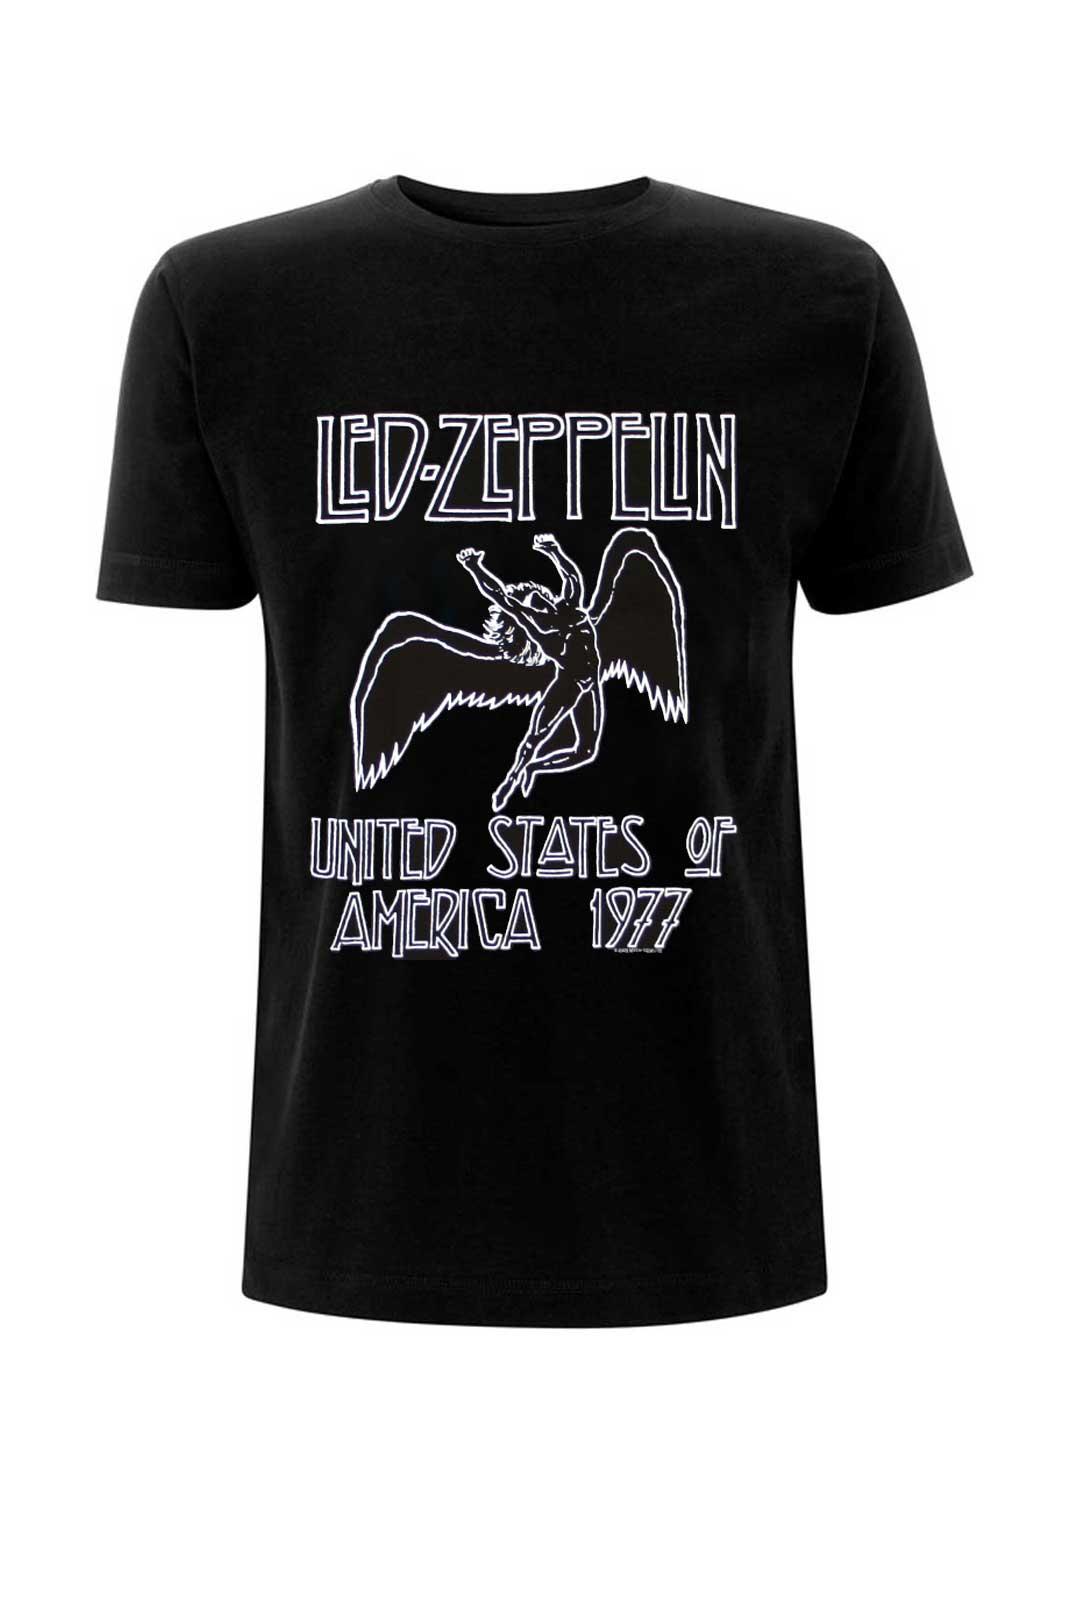 official merchandise tee led zeppelin usa 1977